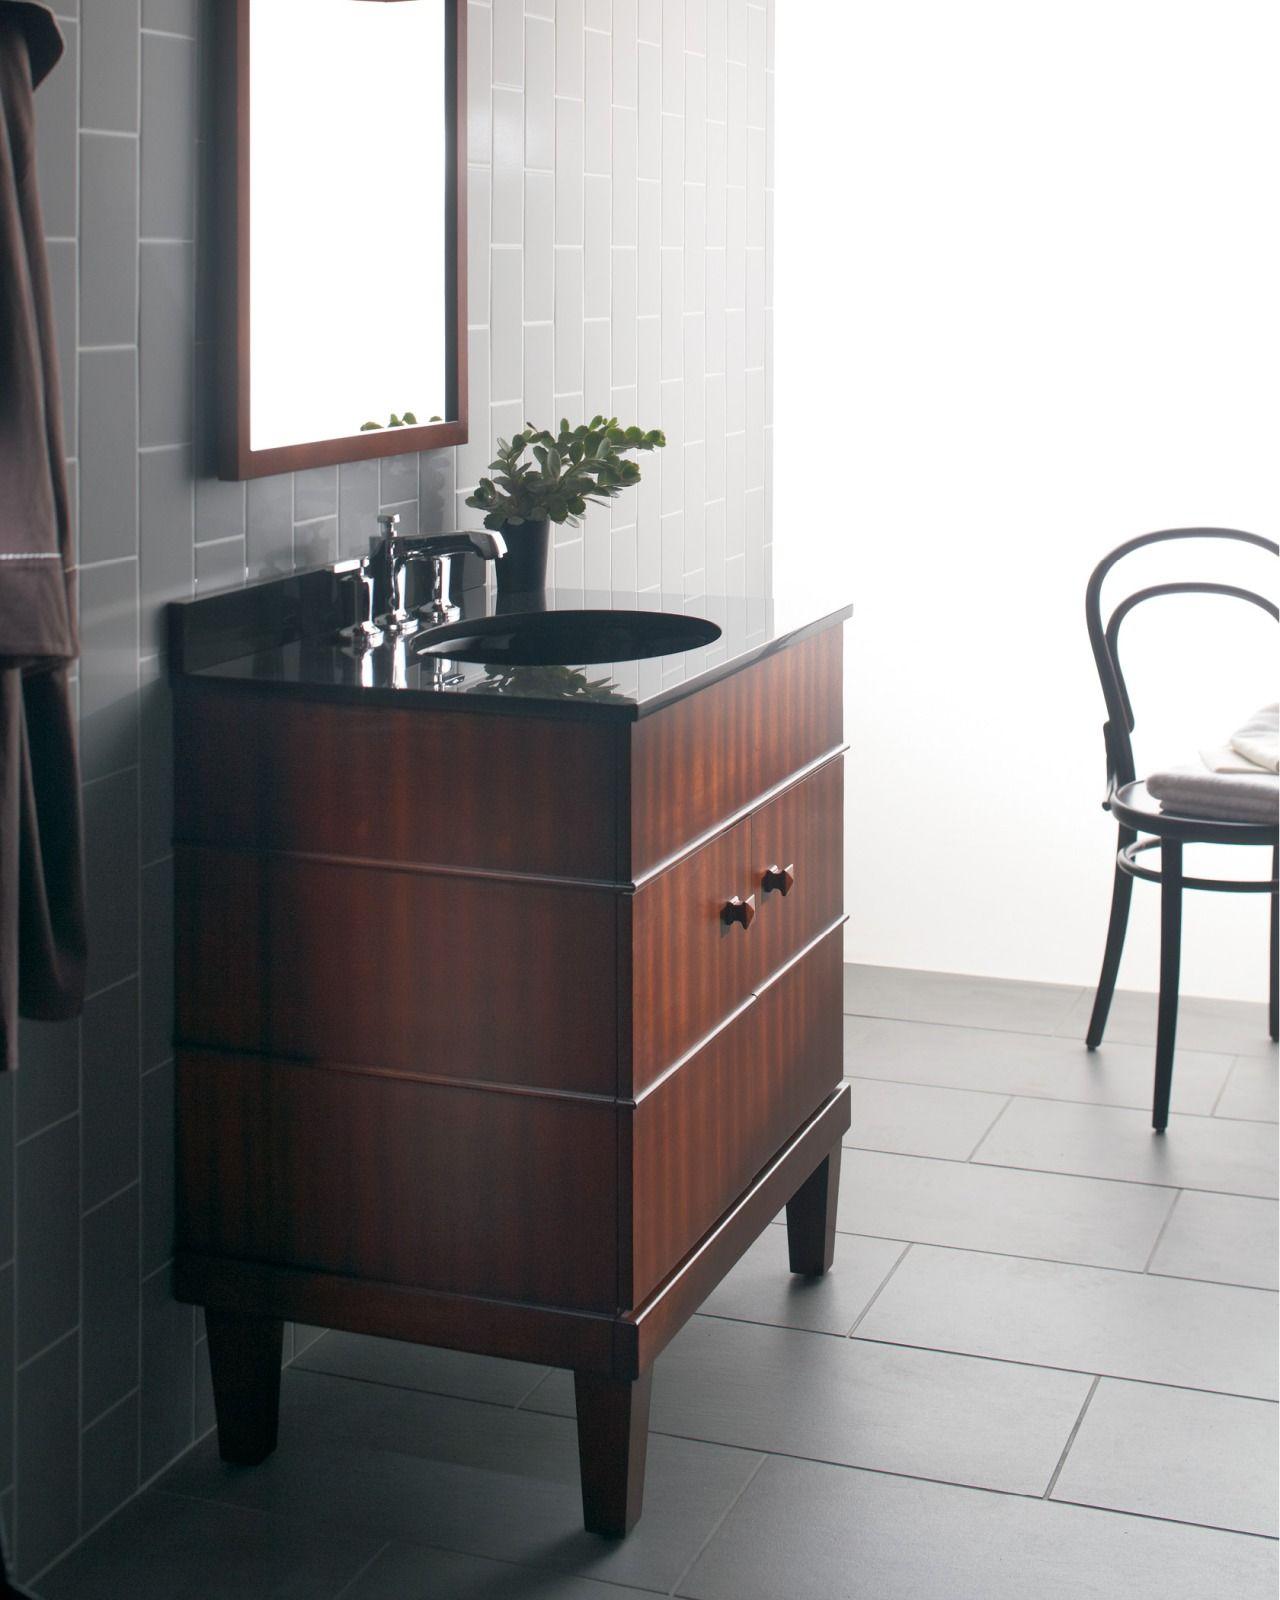 Evendale Bathroom Vanity With Images Vanity Minimalist